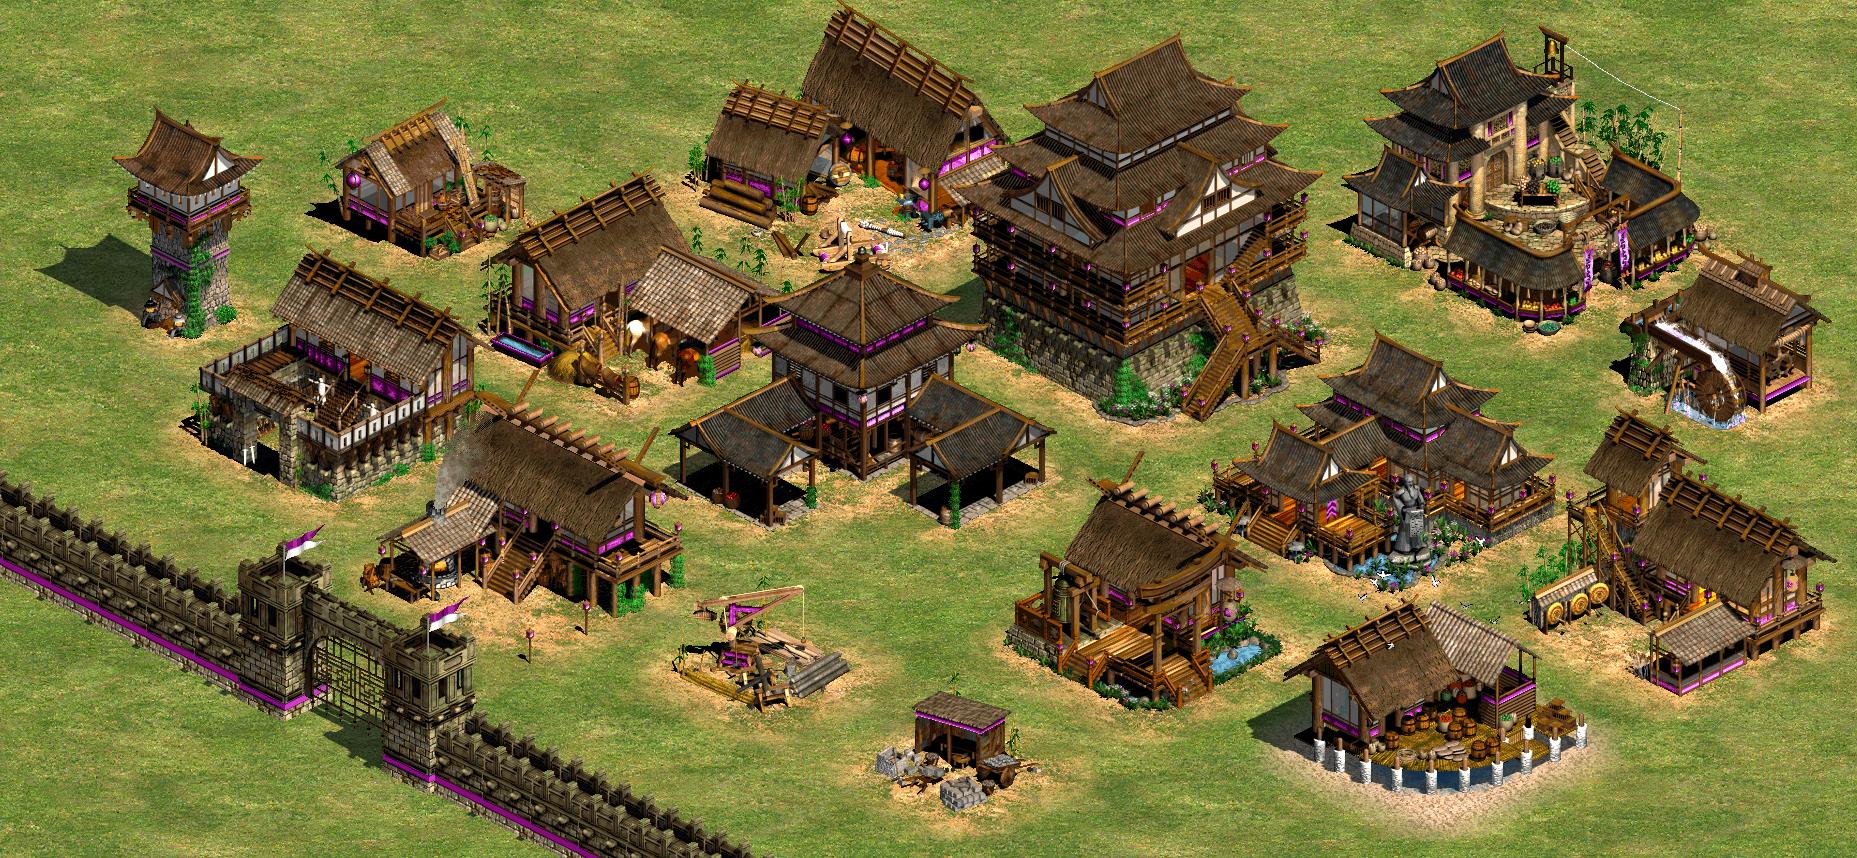 Age of Empires II Definitive Edition Koreliler (Koreans) Rehberi